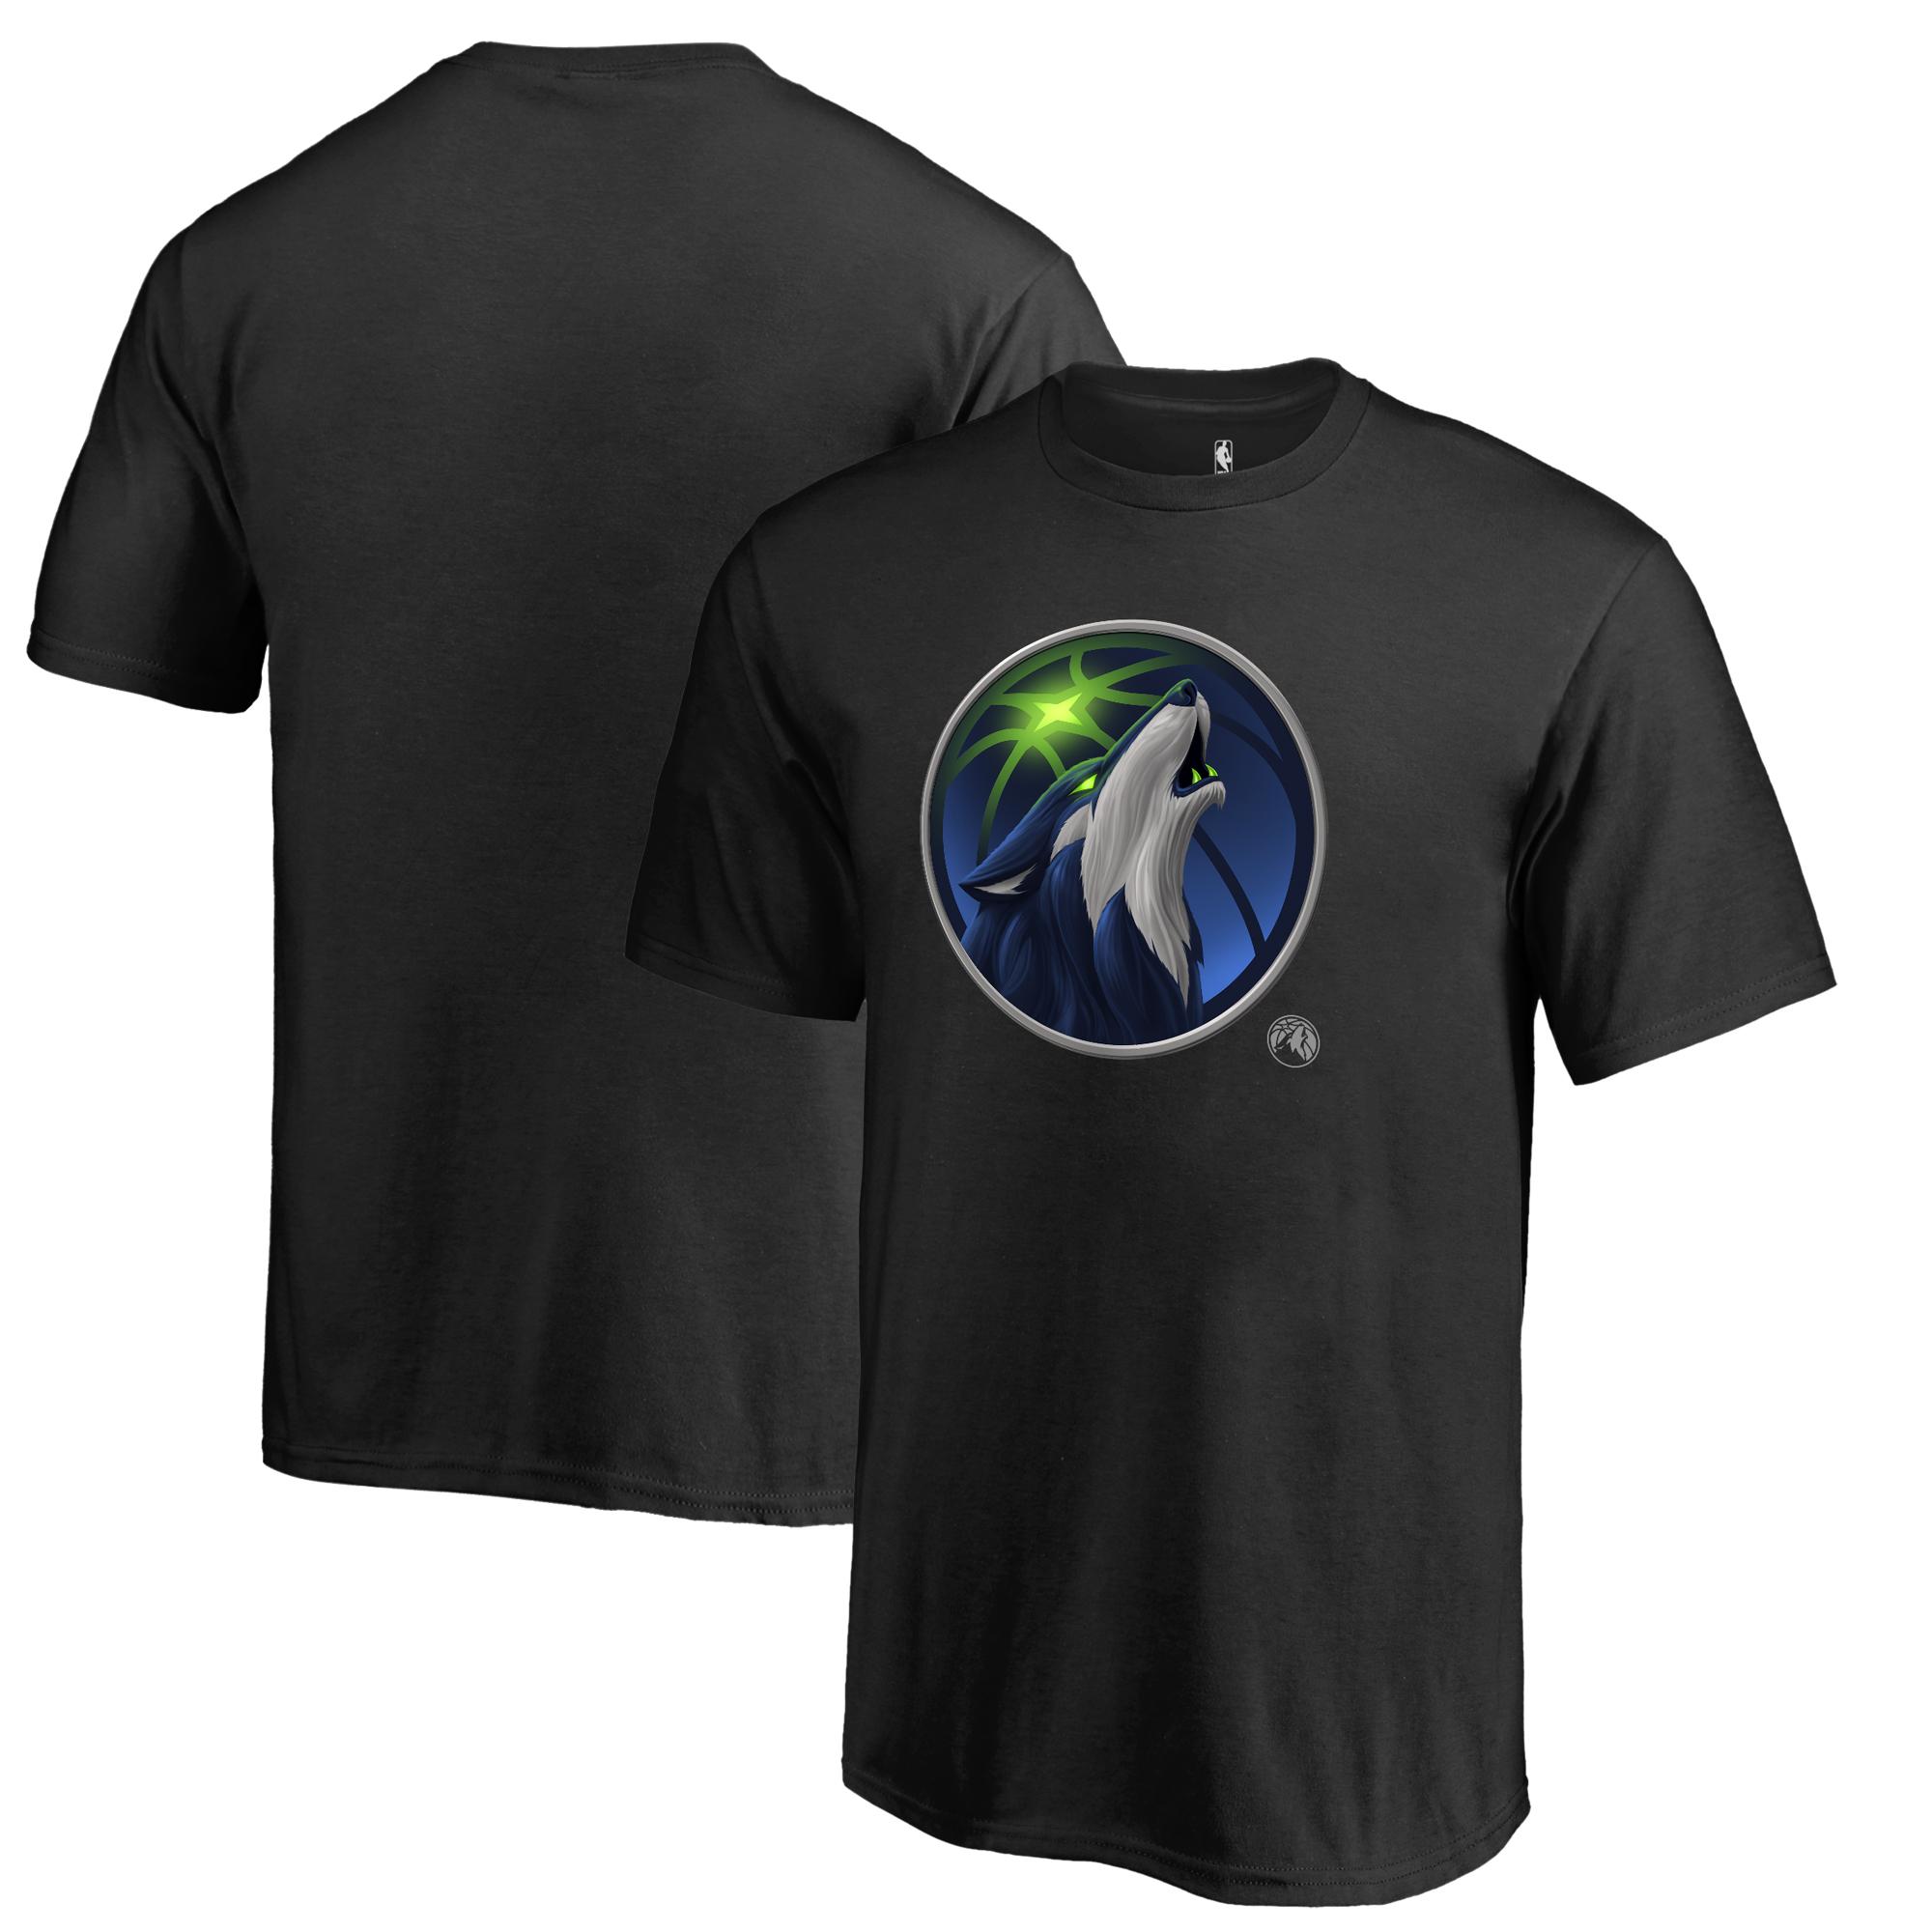 Minnesota Timberwolves Fanatics Branded Youth Midnight Mascot T-Shirt - Black